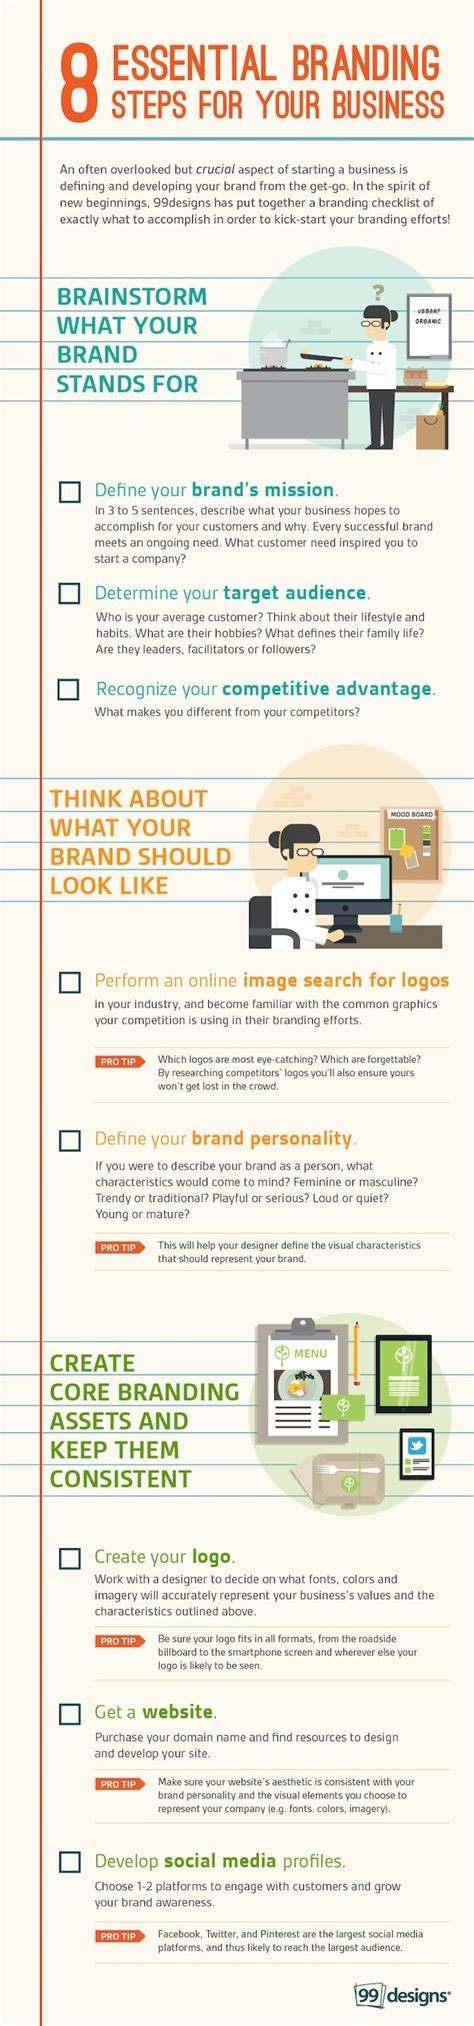 4983 Best Branding Tips Business - 1031 best branding promotion ideas for business images